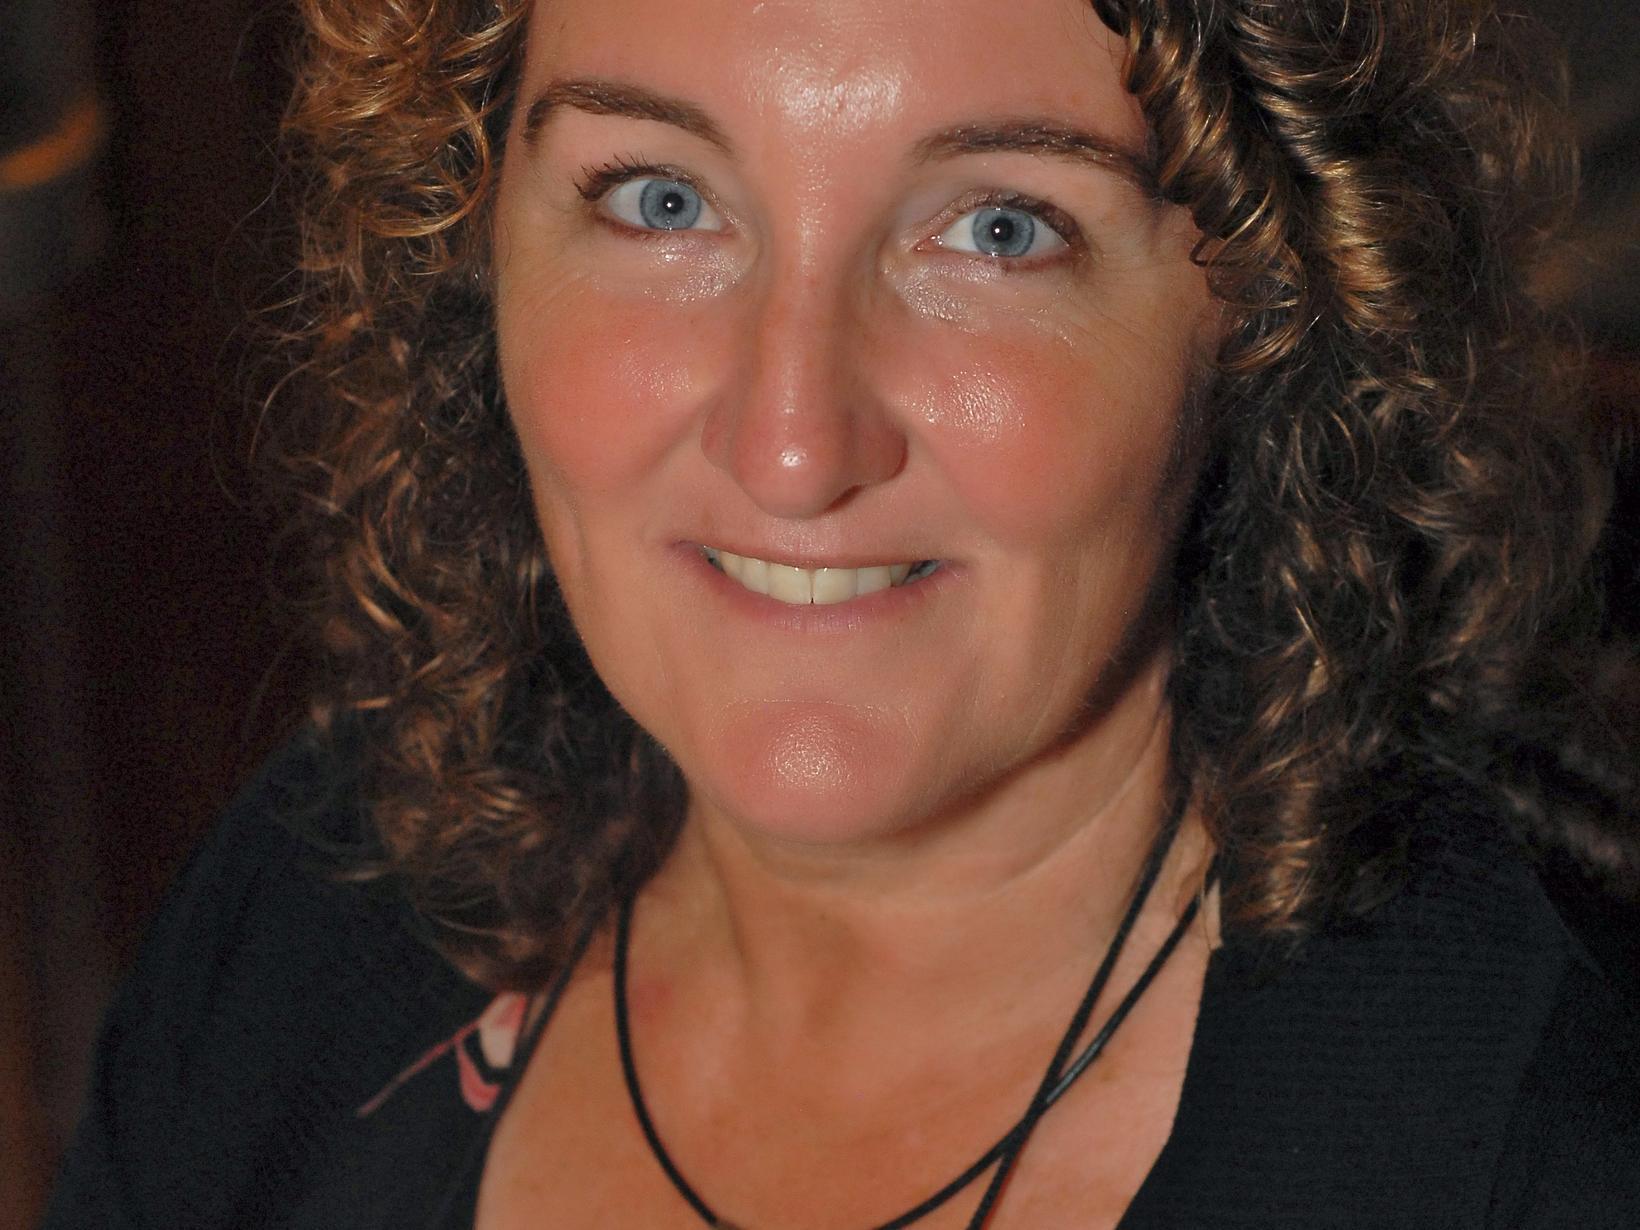 Fiona from Noosa Heads, Queensland, Australia